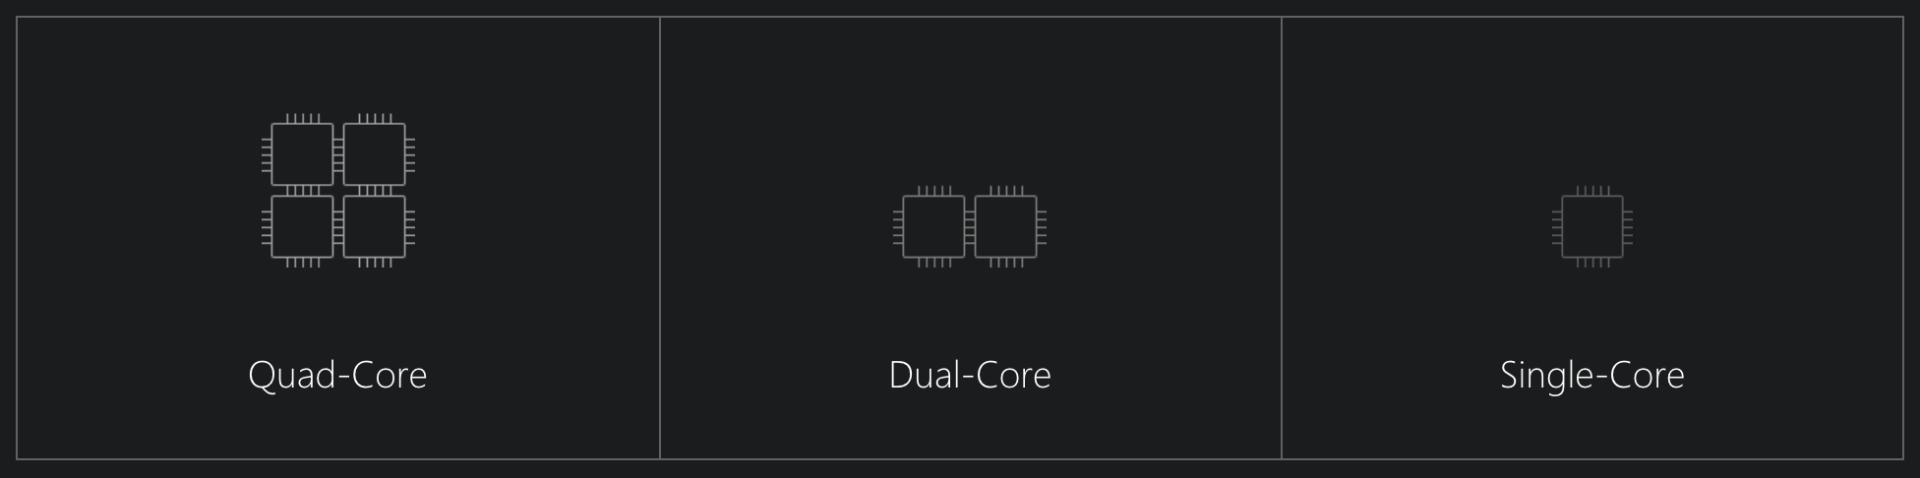 Quad Core, Dual Core, and Single Core